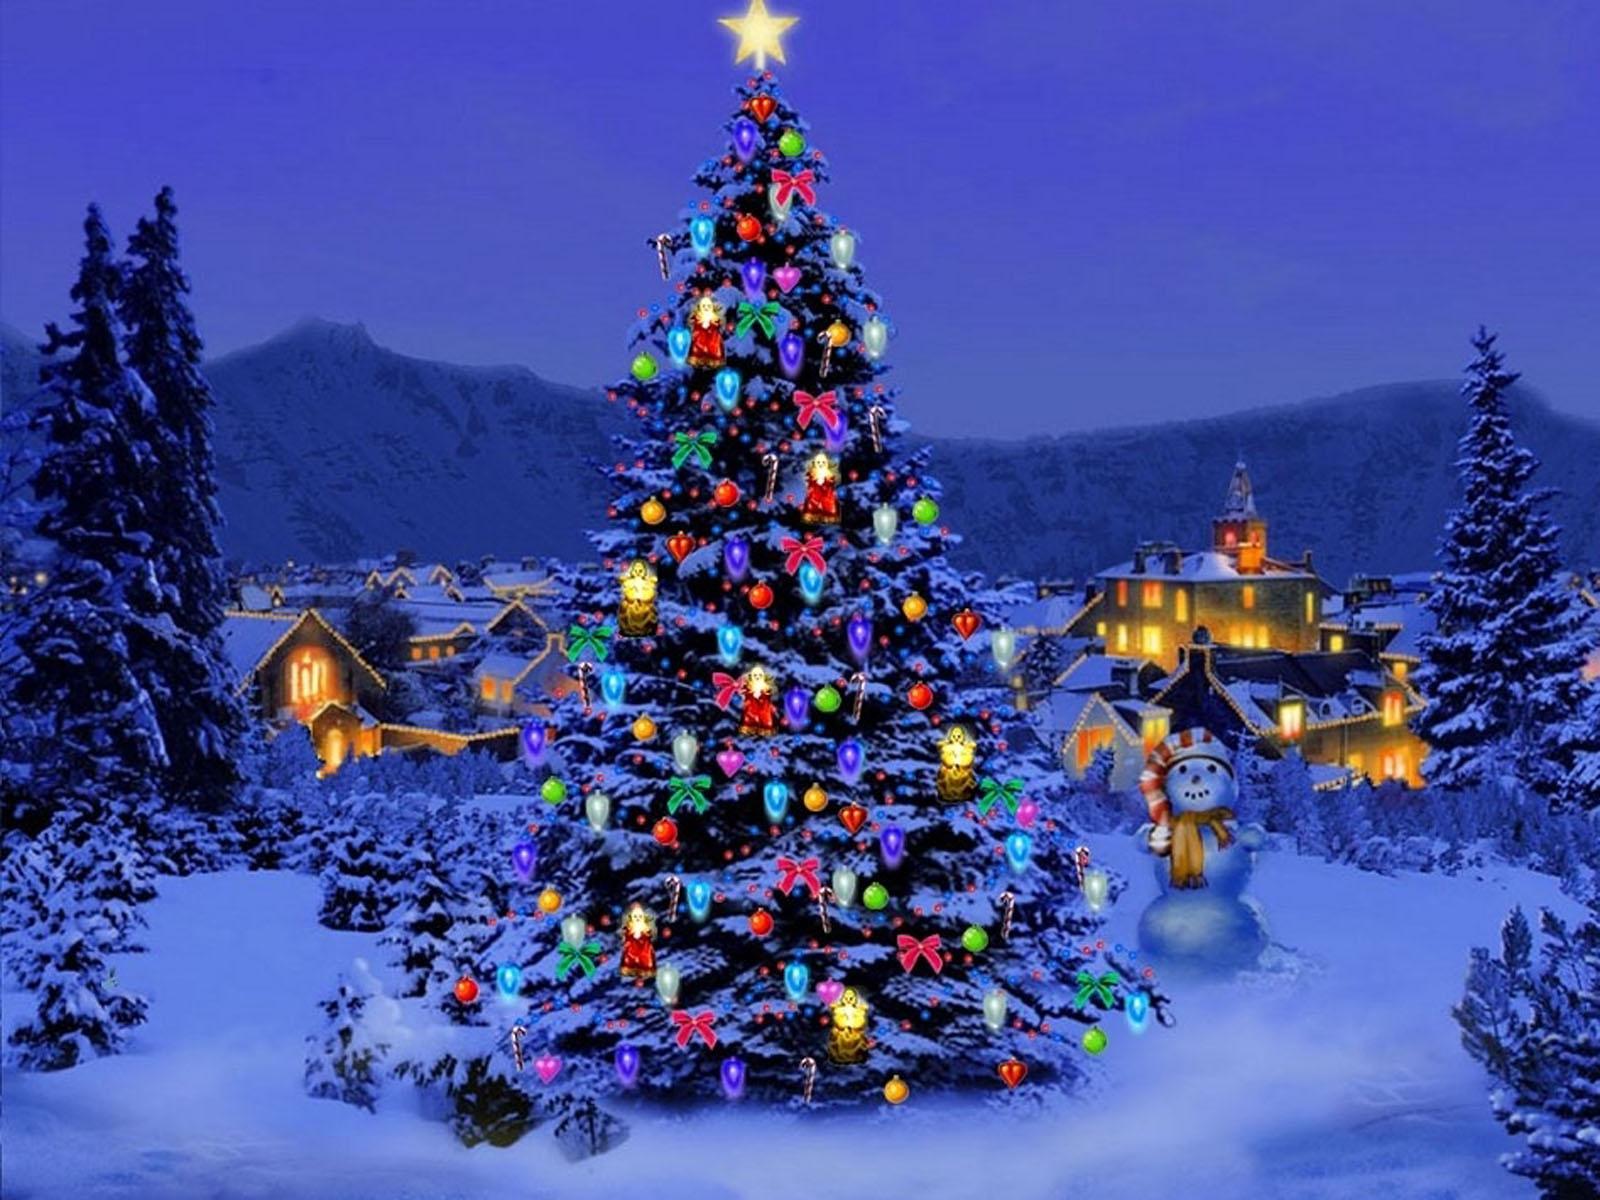 Christmas Tree Background Wallpaper - WallpaperSafari